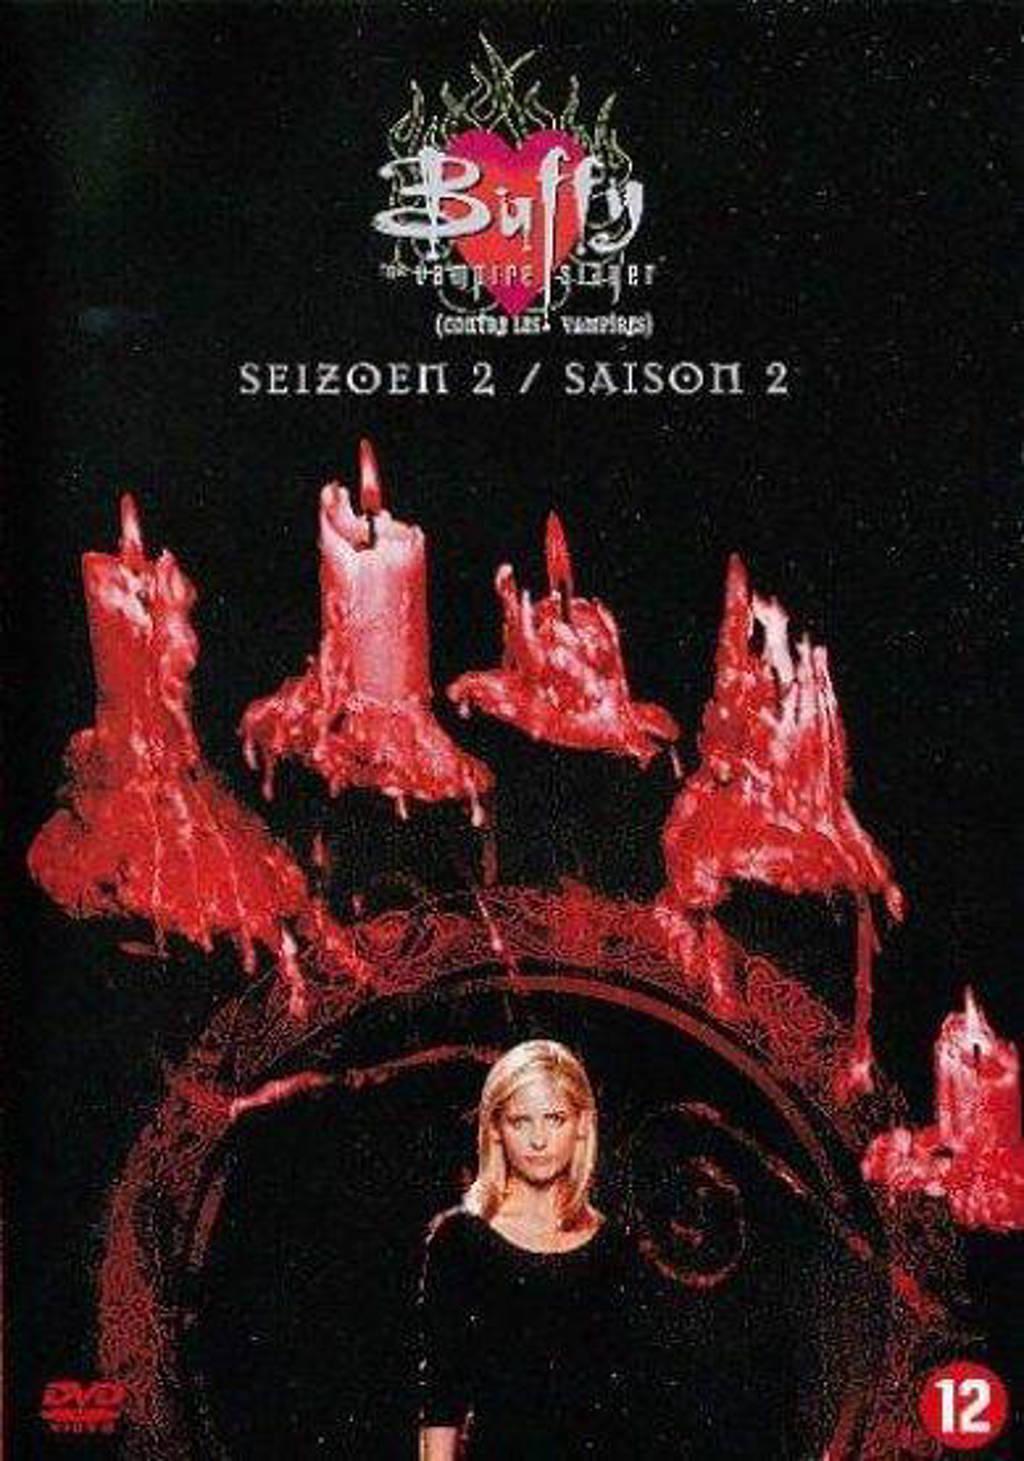 Buffy the vampire slayer - Seizoen 2 (DVD)